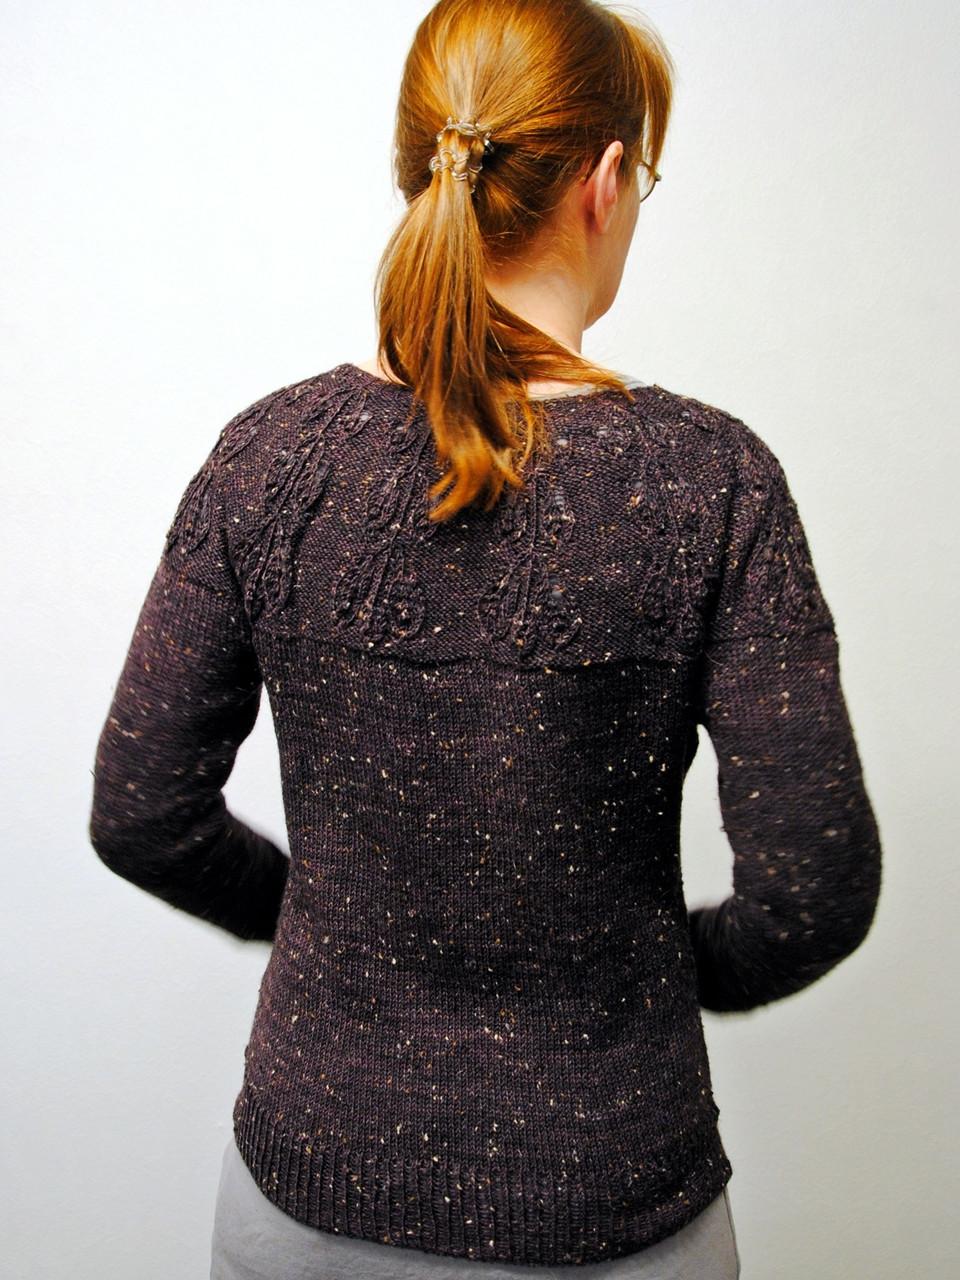 Mirkwood Cardigan - waist shaping and back shaping